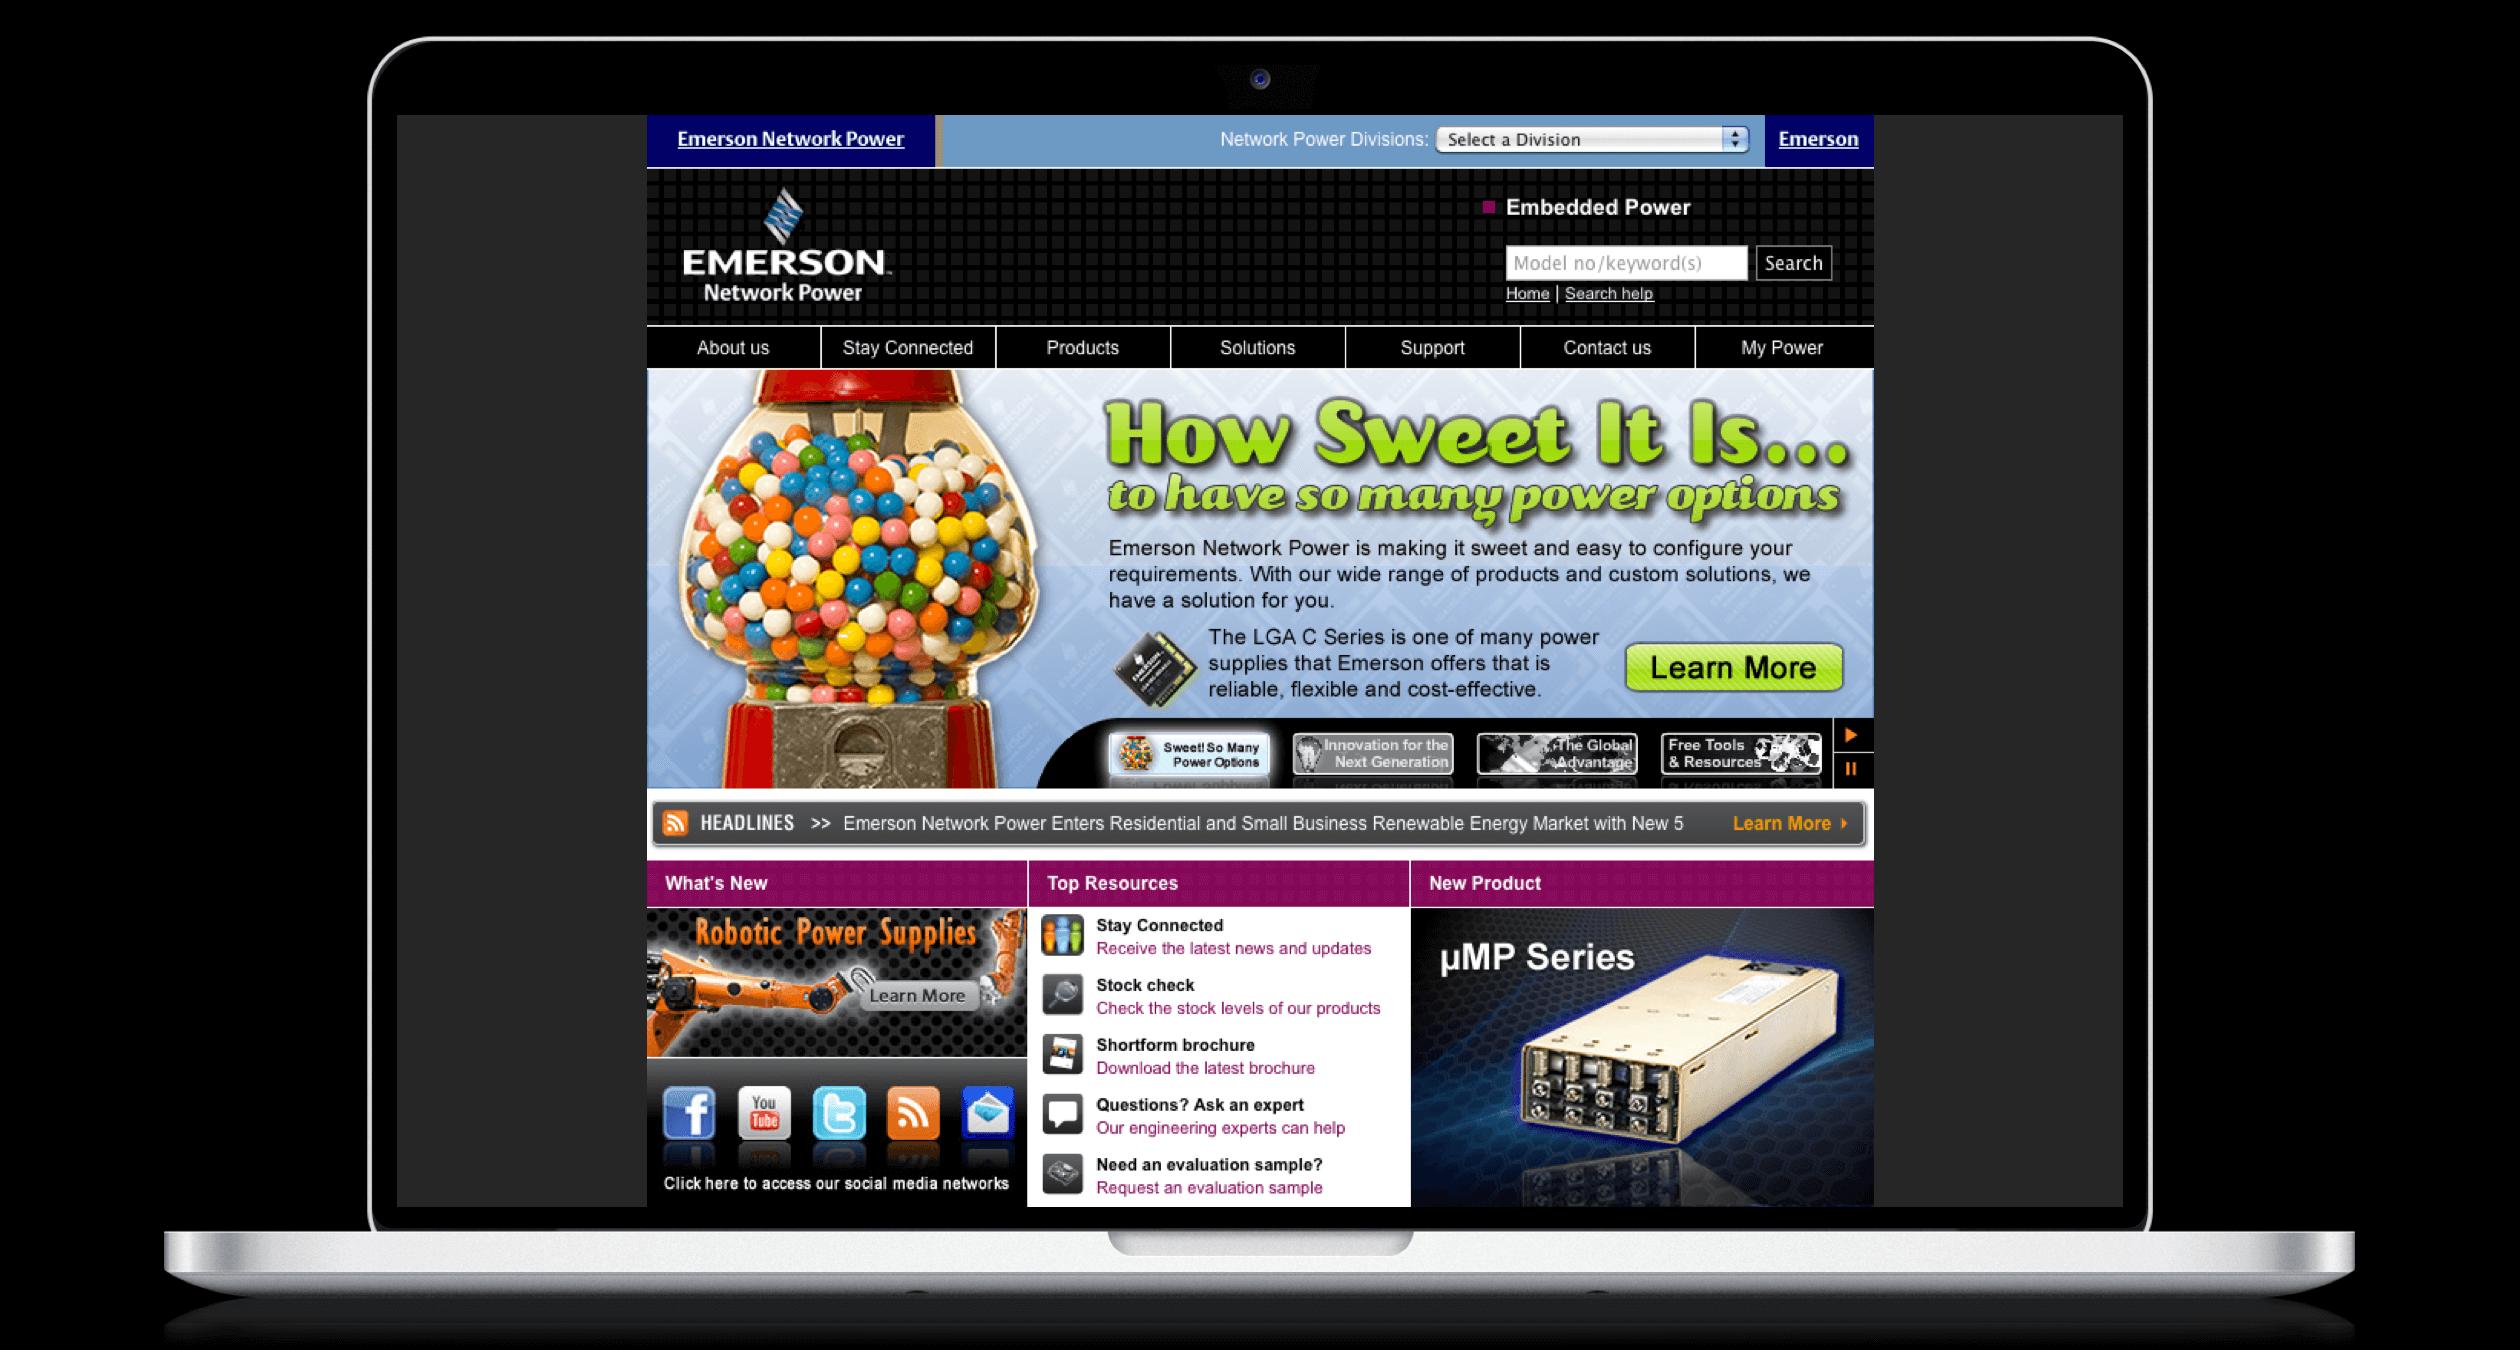 PHX-Web-Agency-Emerson-AC-DC-Power-Supplies-Website-Design-Before